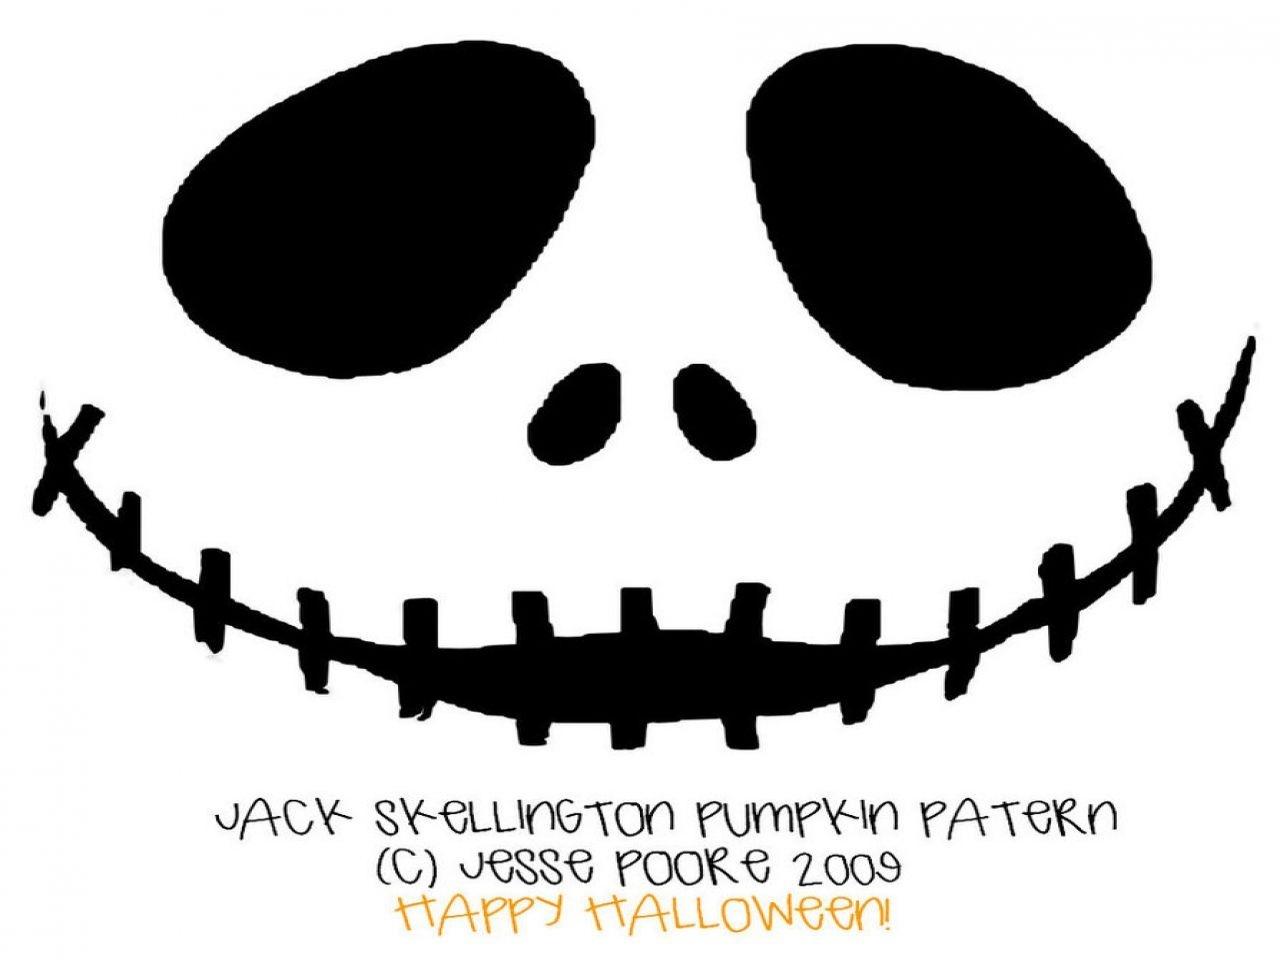 Free Printable Jack Skellington Pumpkin Carving Stencil Templates - Jack Skellington Stencil Free Printable